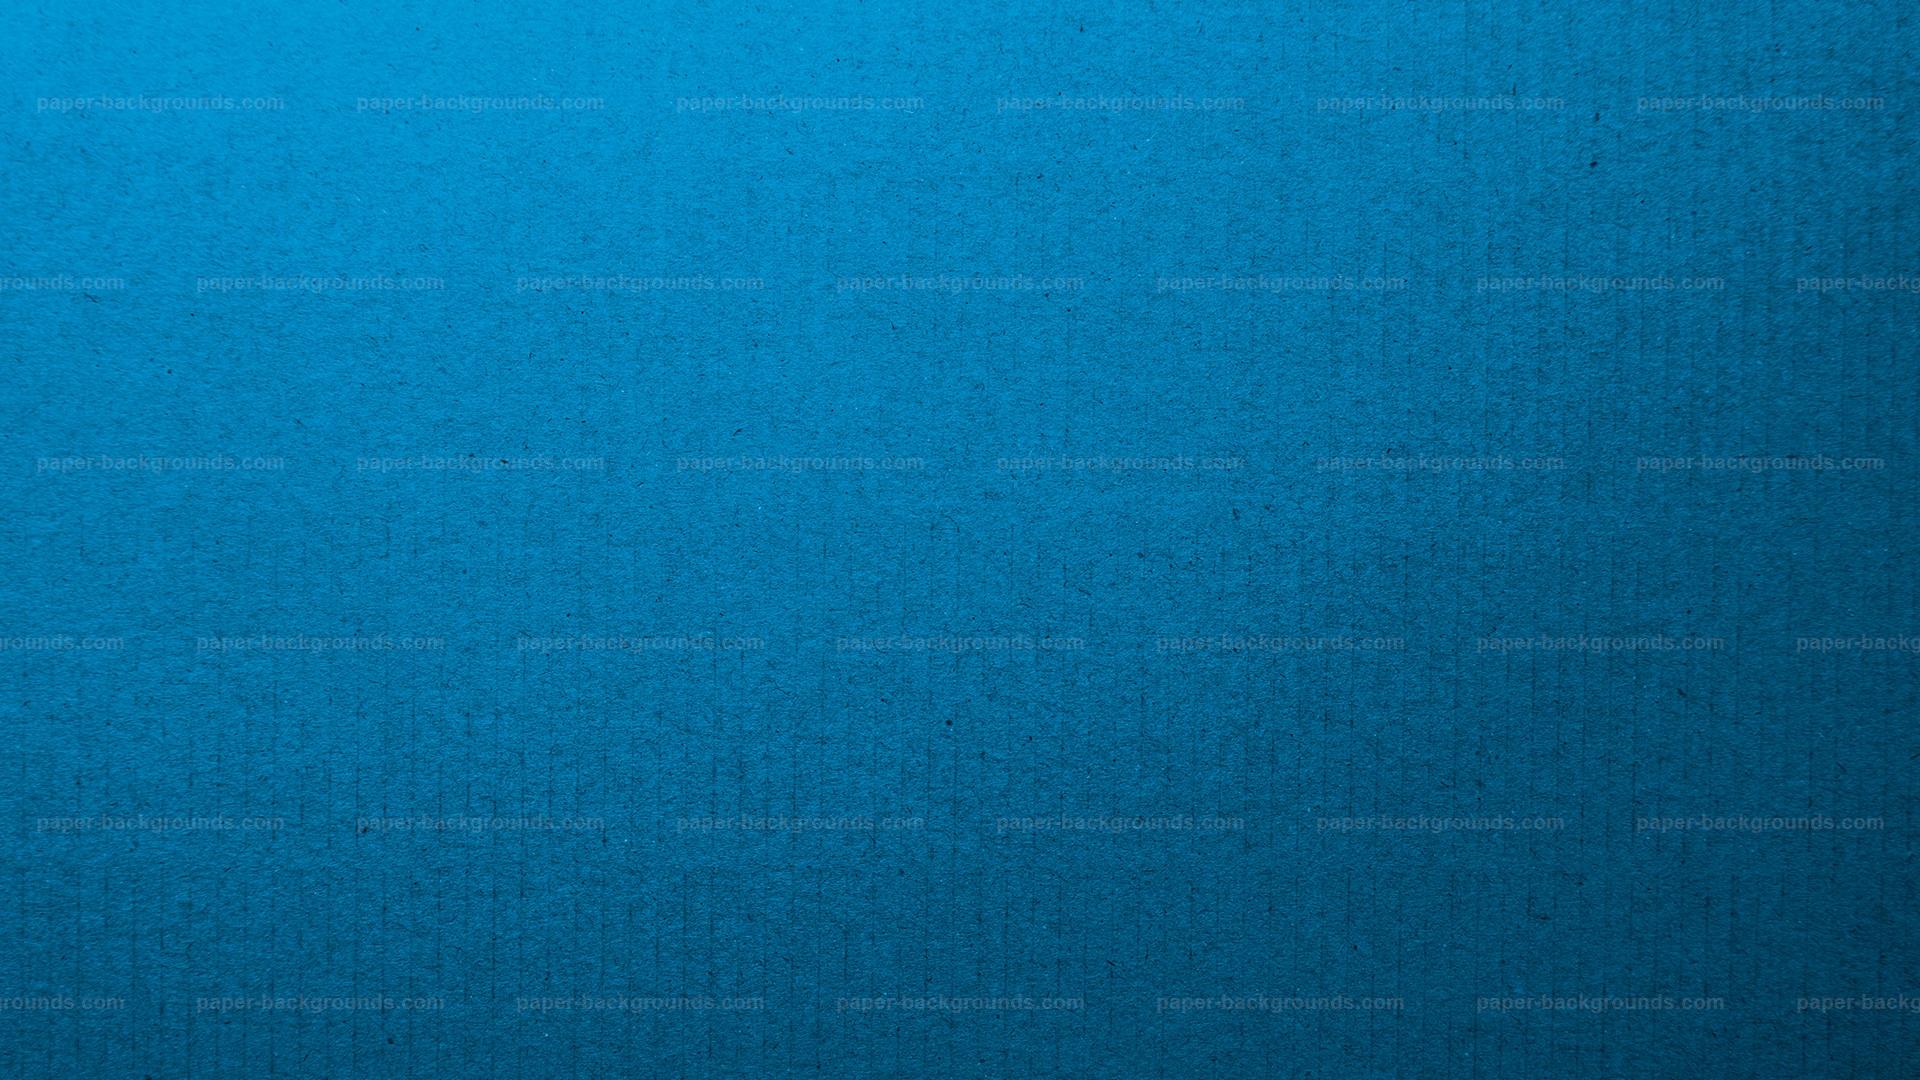 Blue Hd Wallpapers 1080p: Blue HD Wallpapers 1080p